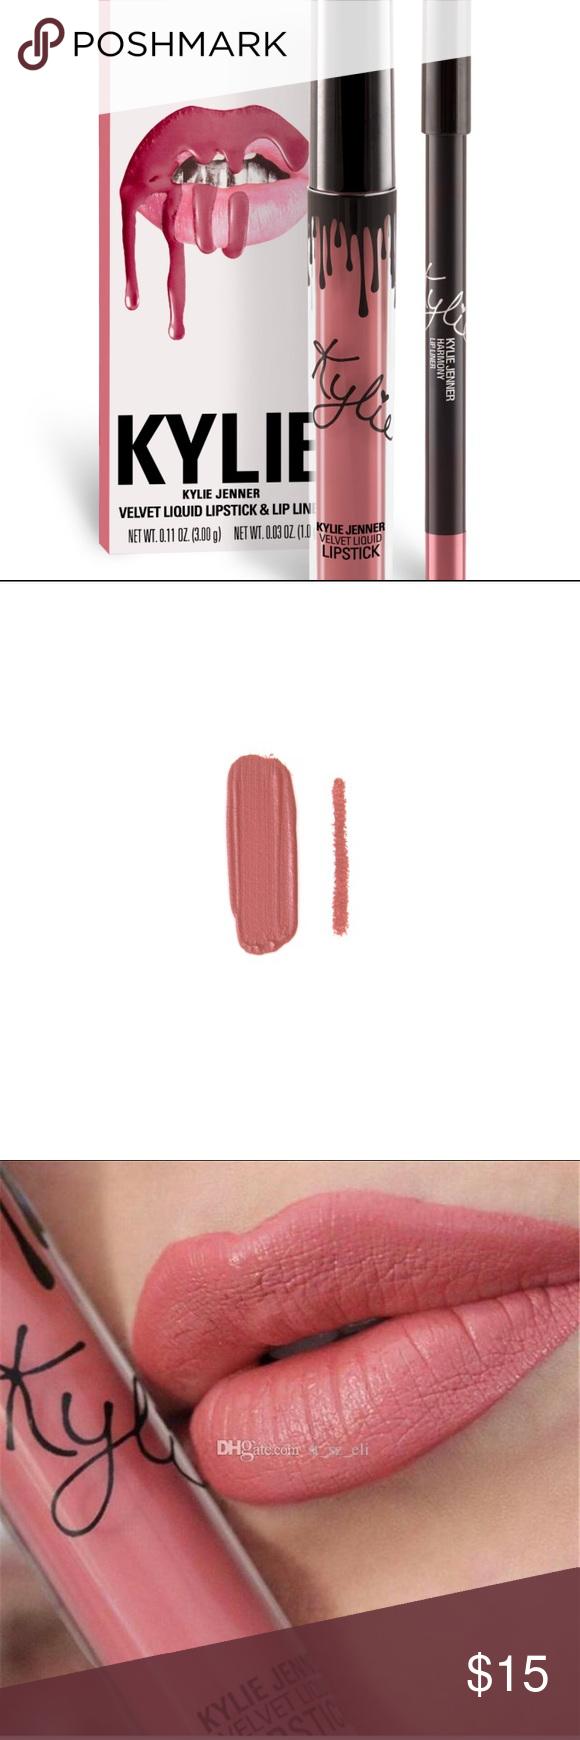 Kylie Lip Kit - Harmony